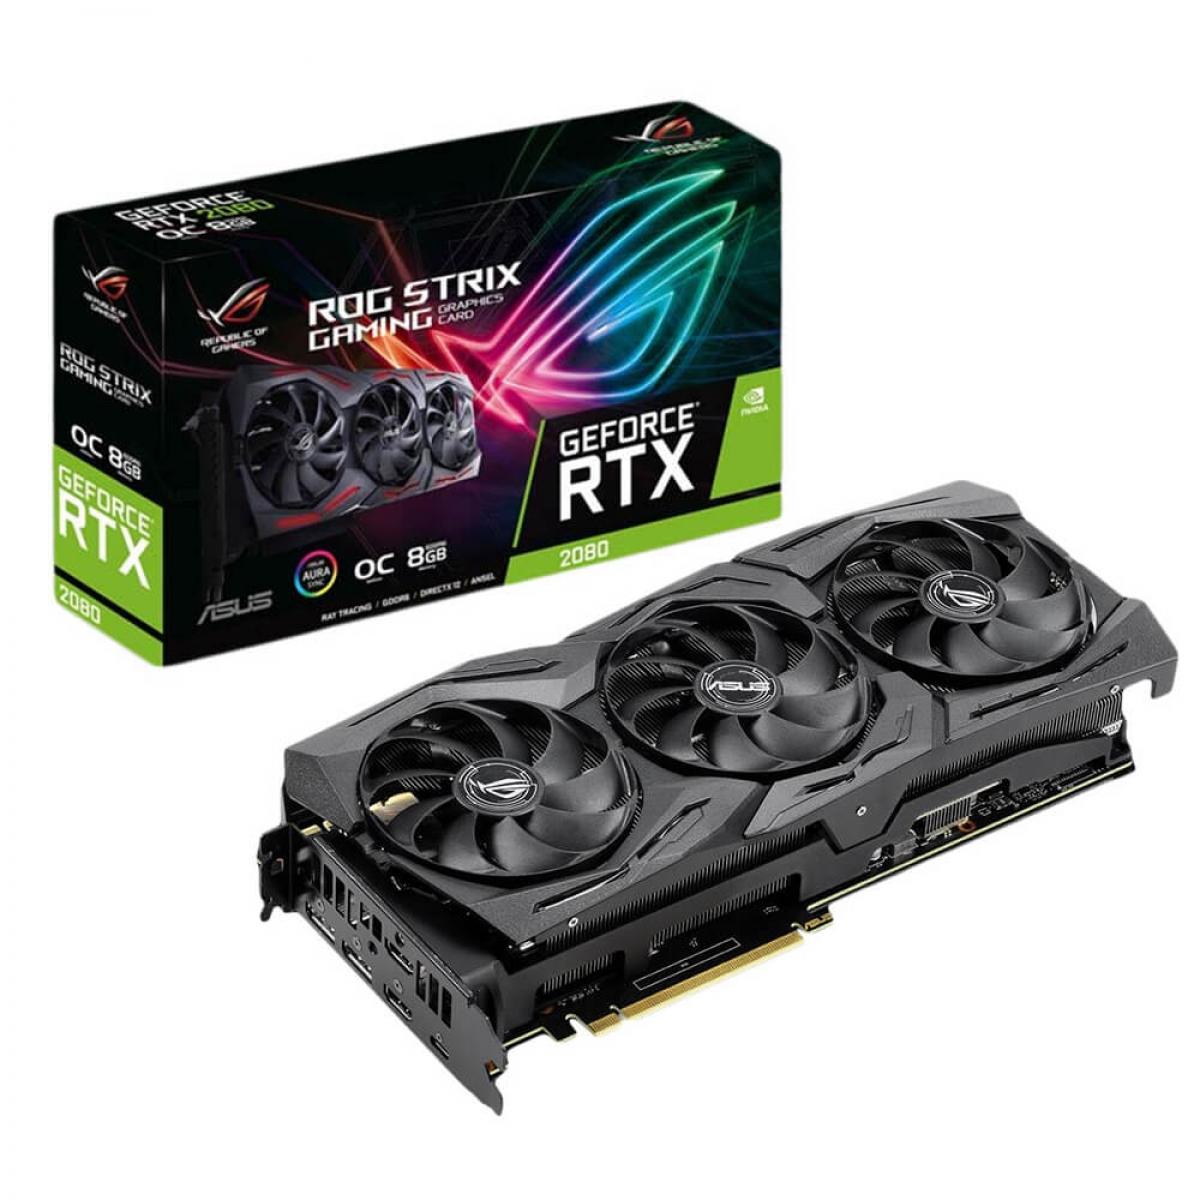 Placa de Vídeo Asus  Geforce RTX 2080 OC Rog Strix Gaming, 8GB GDDR6, 256Bit, ROG-STRIX-RTX2080-O8G-GAMING